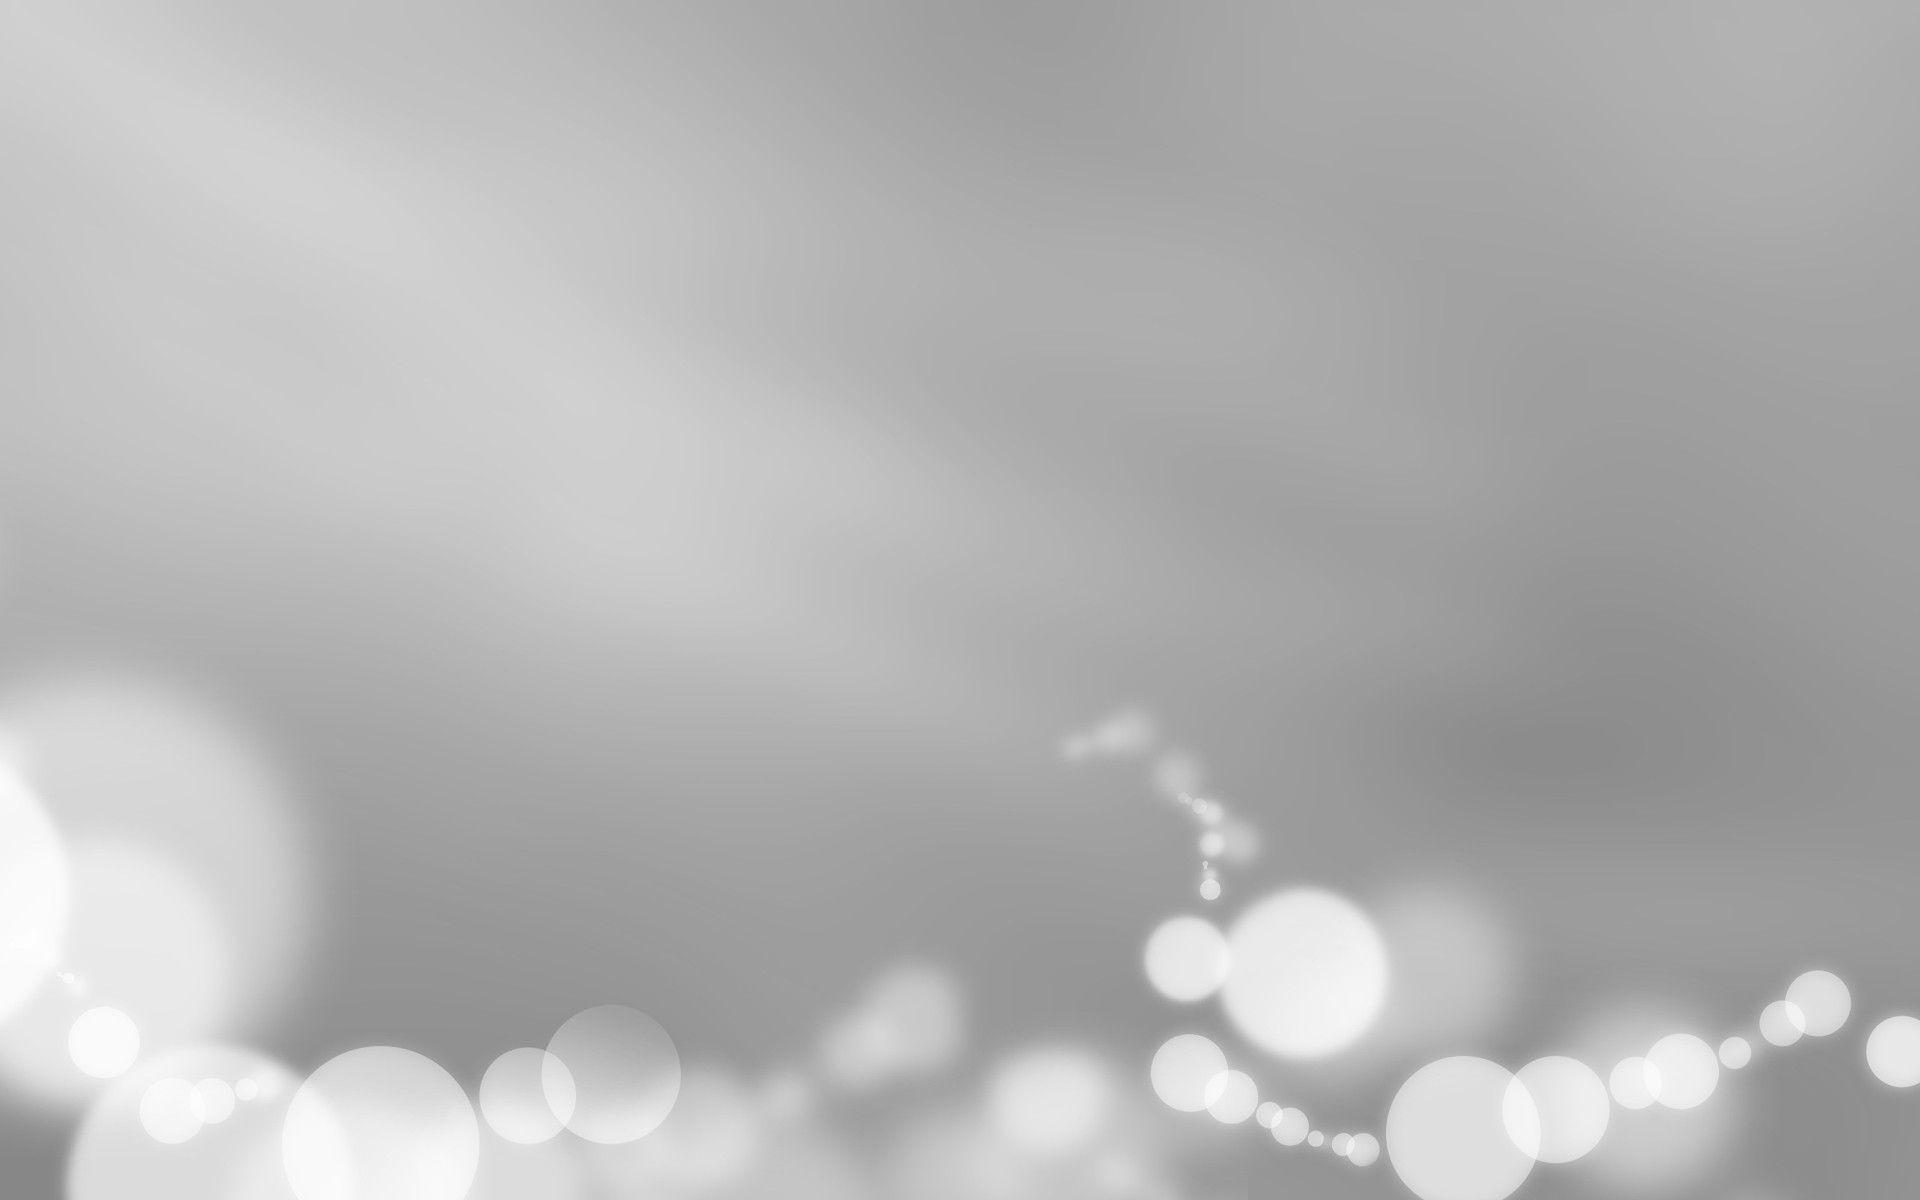 Fresh-Grey-Wallpaper-Bubbles-Image-Lightning-Picture.jpg